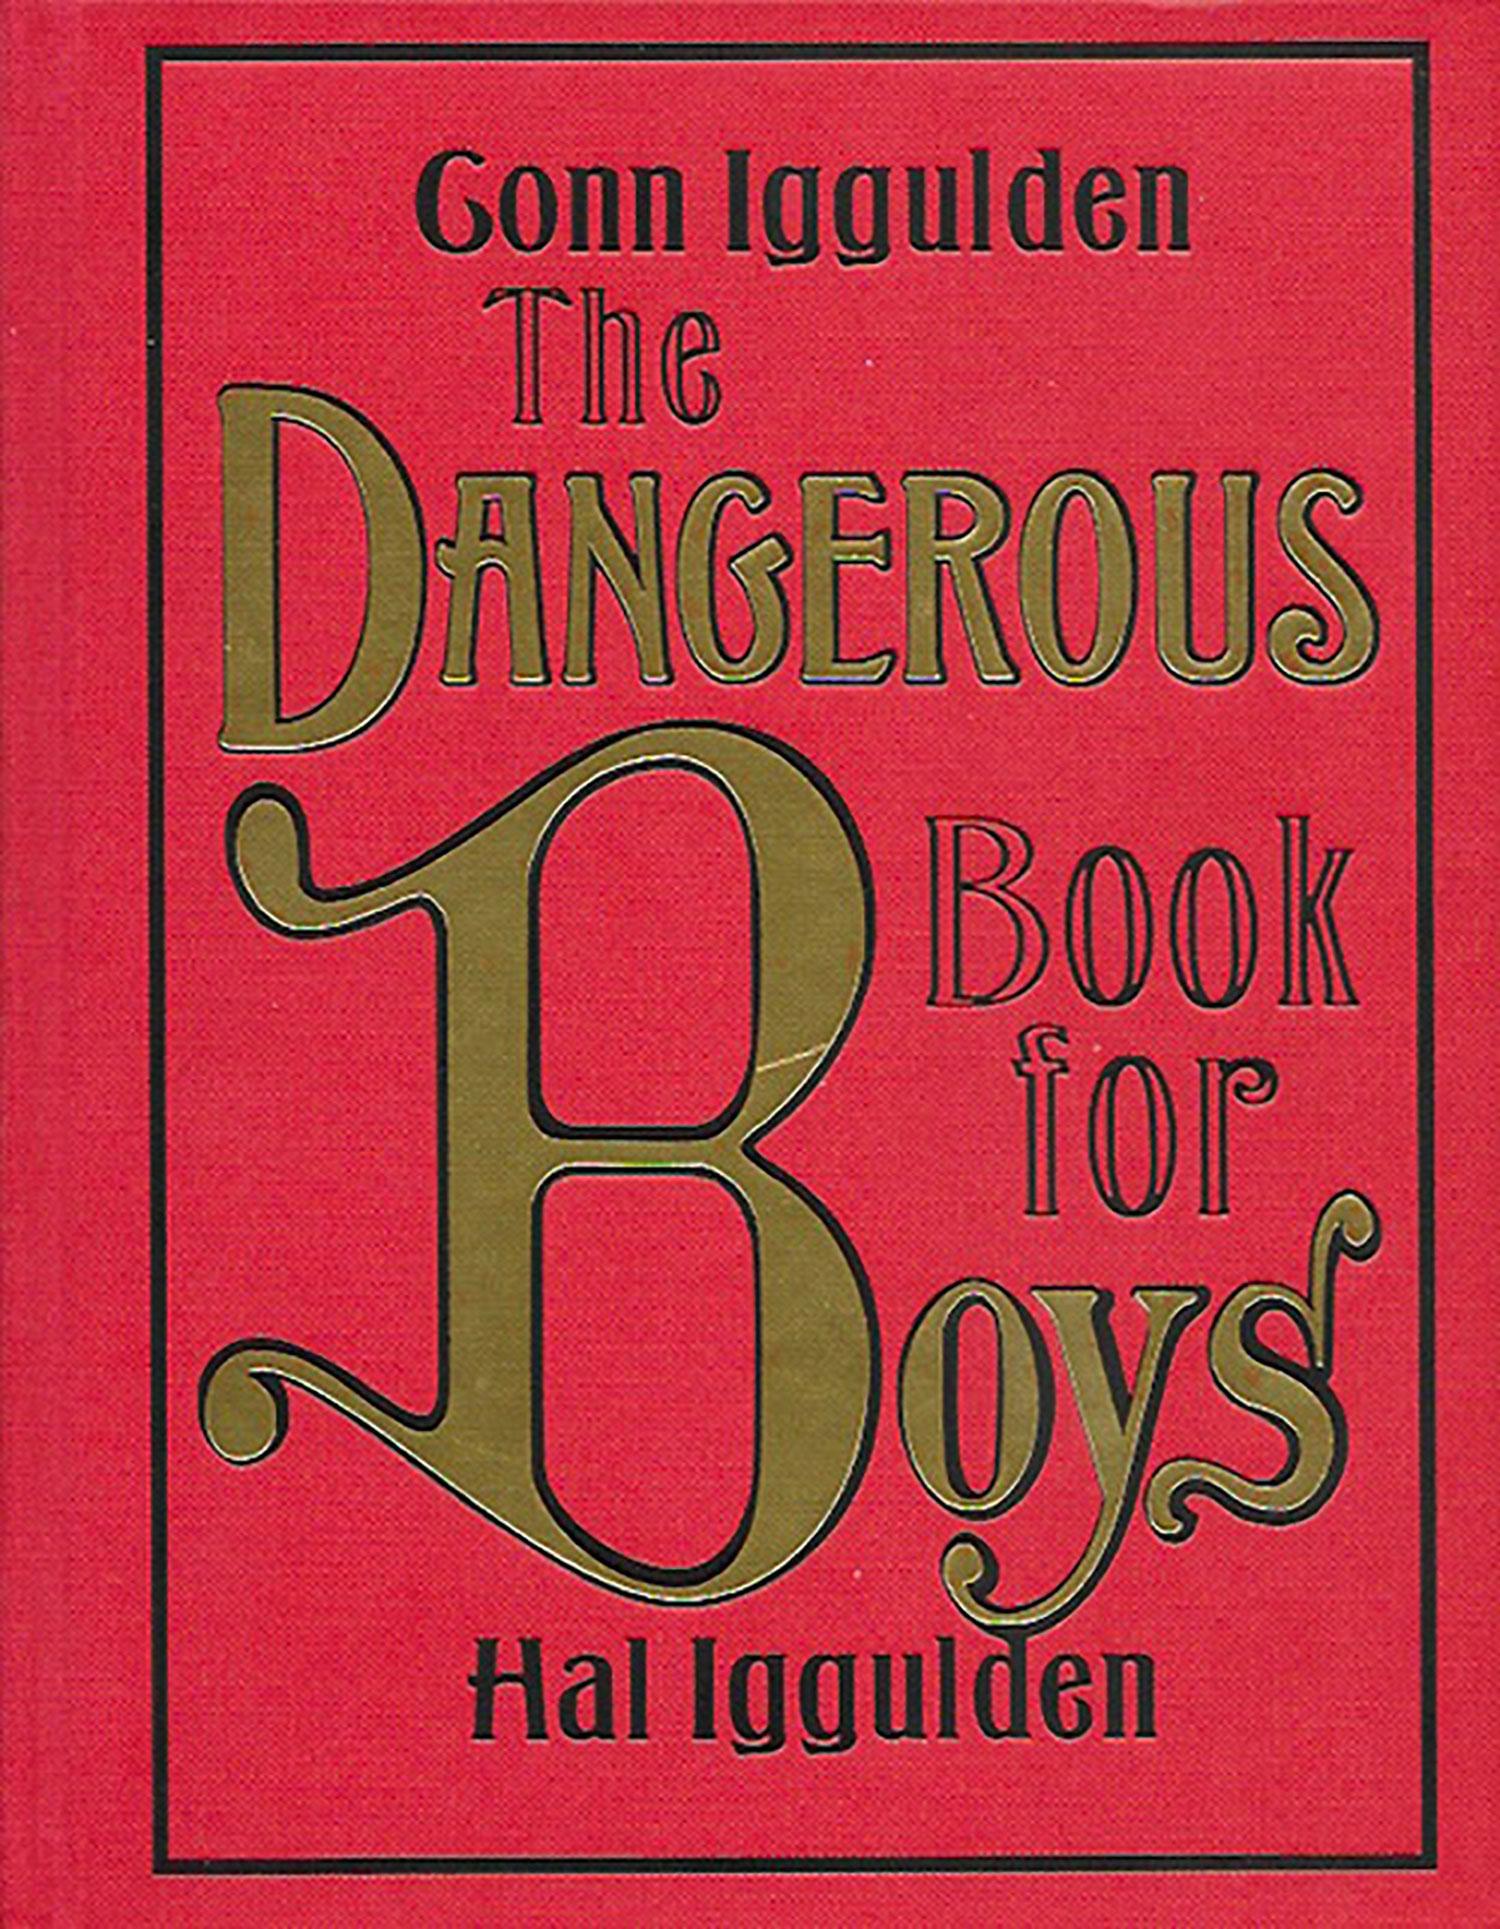 thedangerousbookforboys.jpg